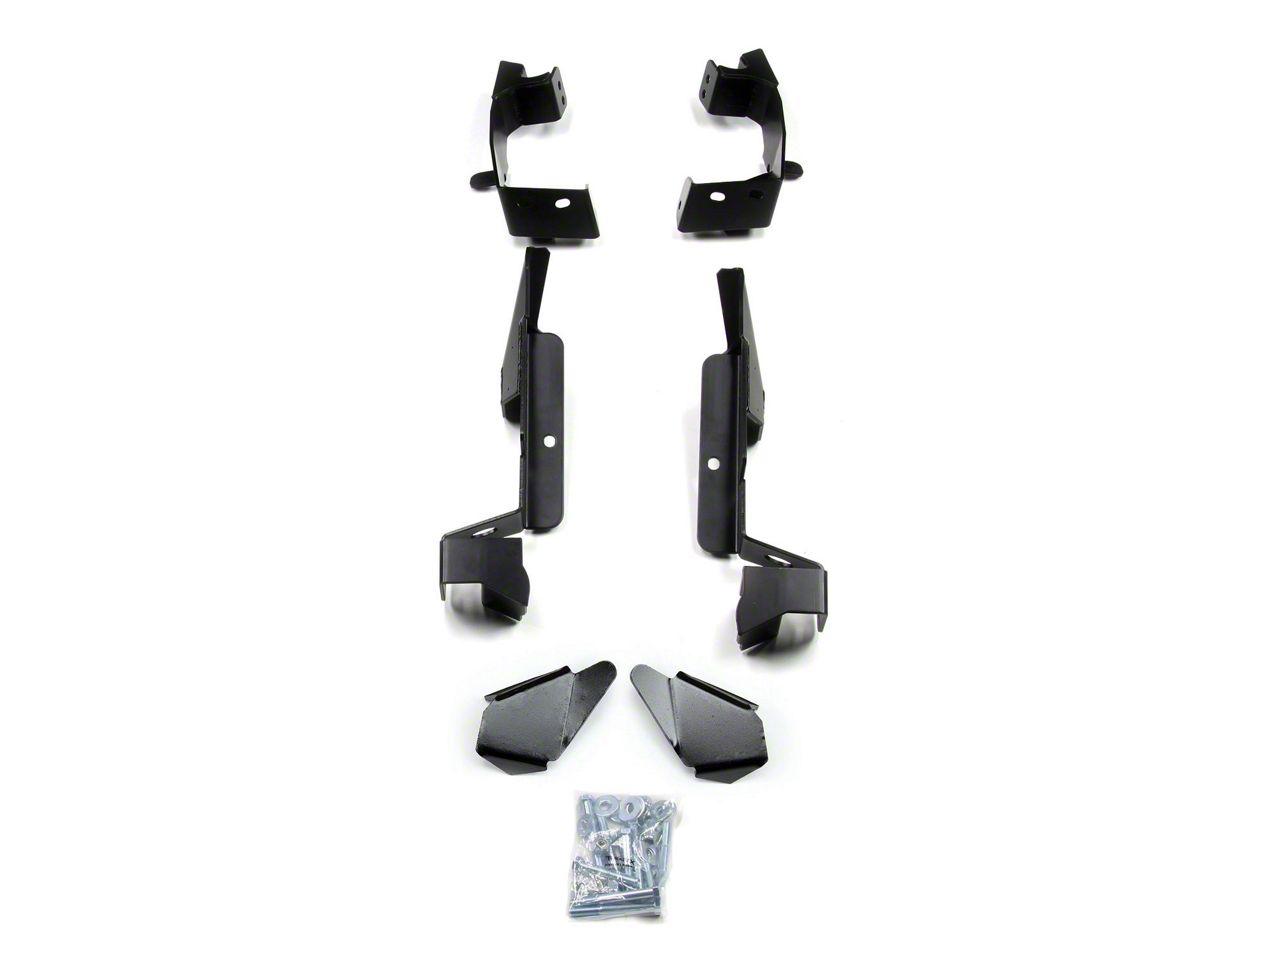 Teraflex Elite LCG Long Adjustable FlexArm Bracket Kit (07-18 Jeep Wrangler JK)